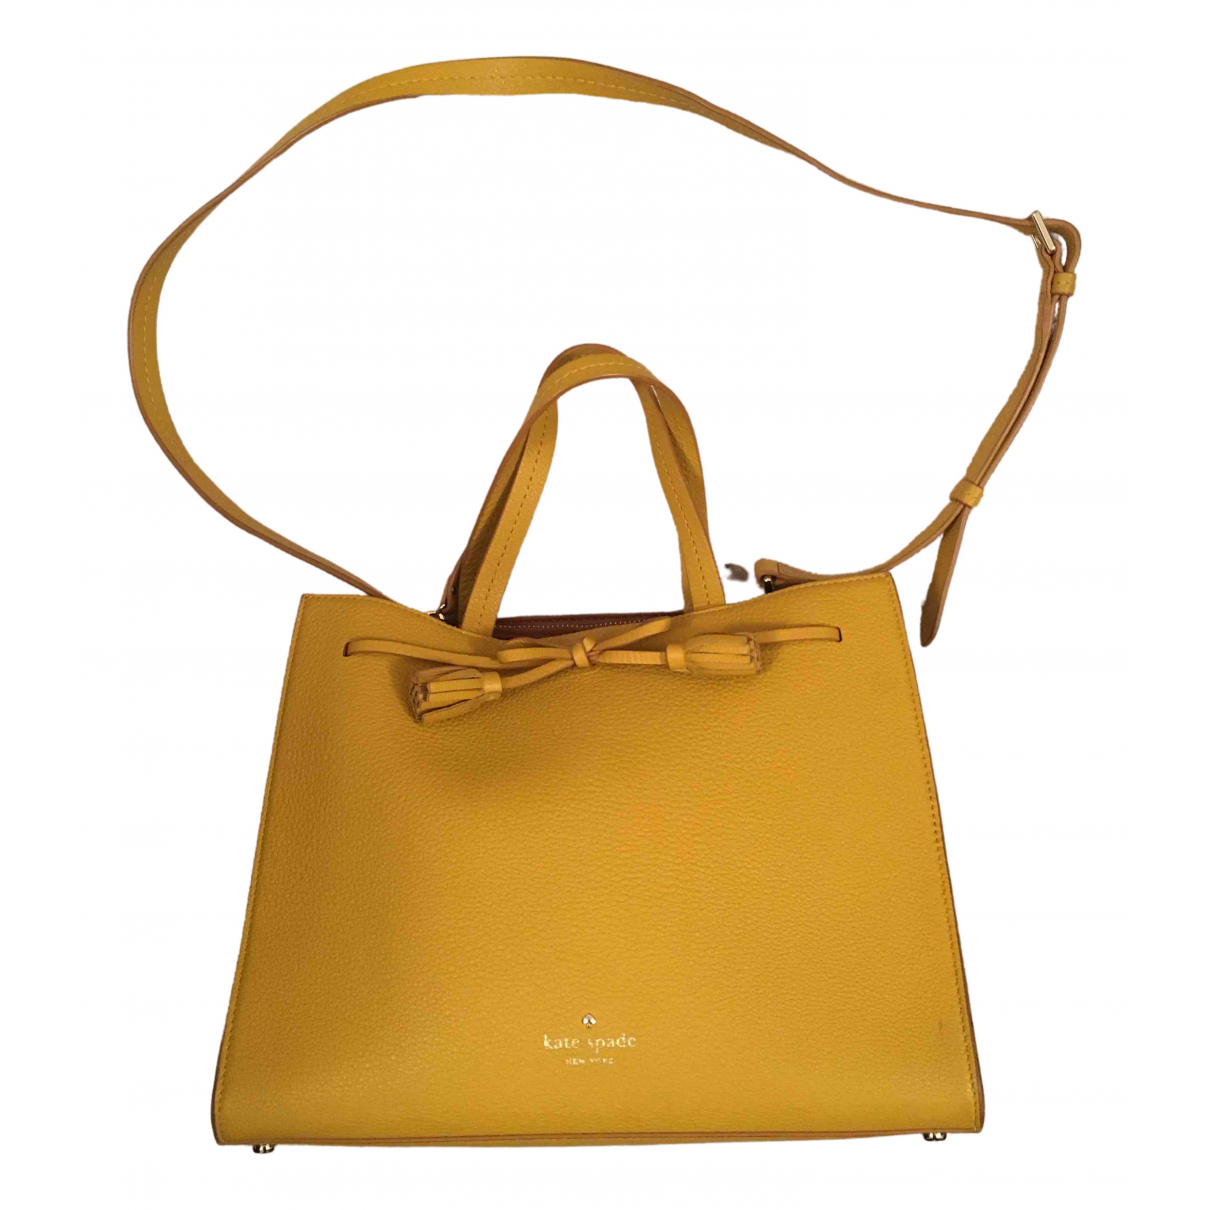 Kate Spade \N Yellow Leather handbag for Women \N